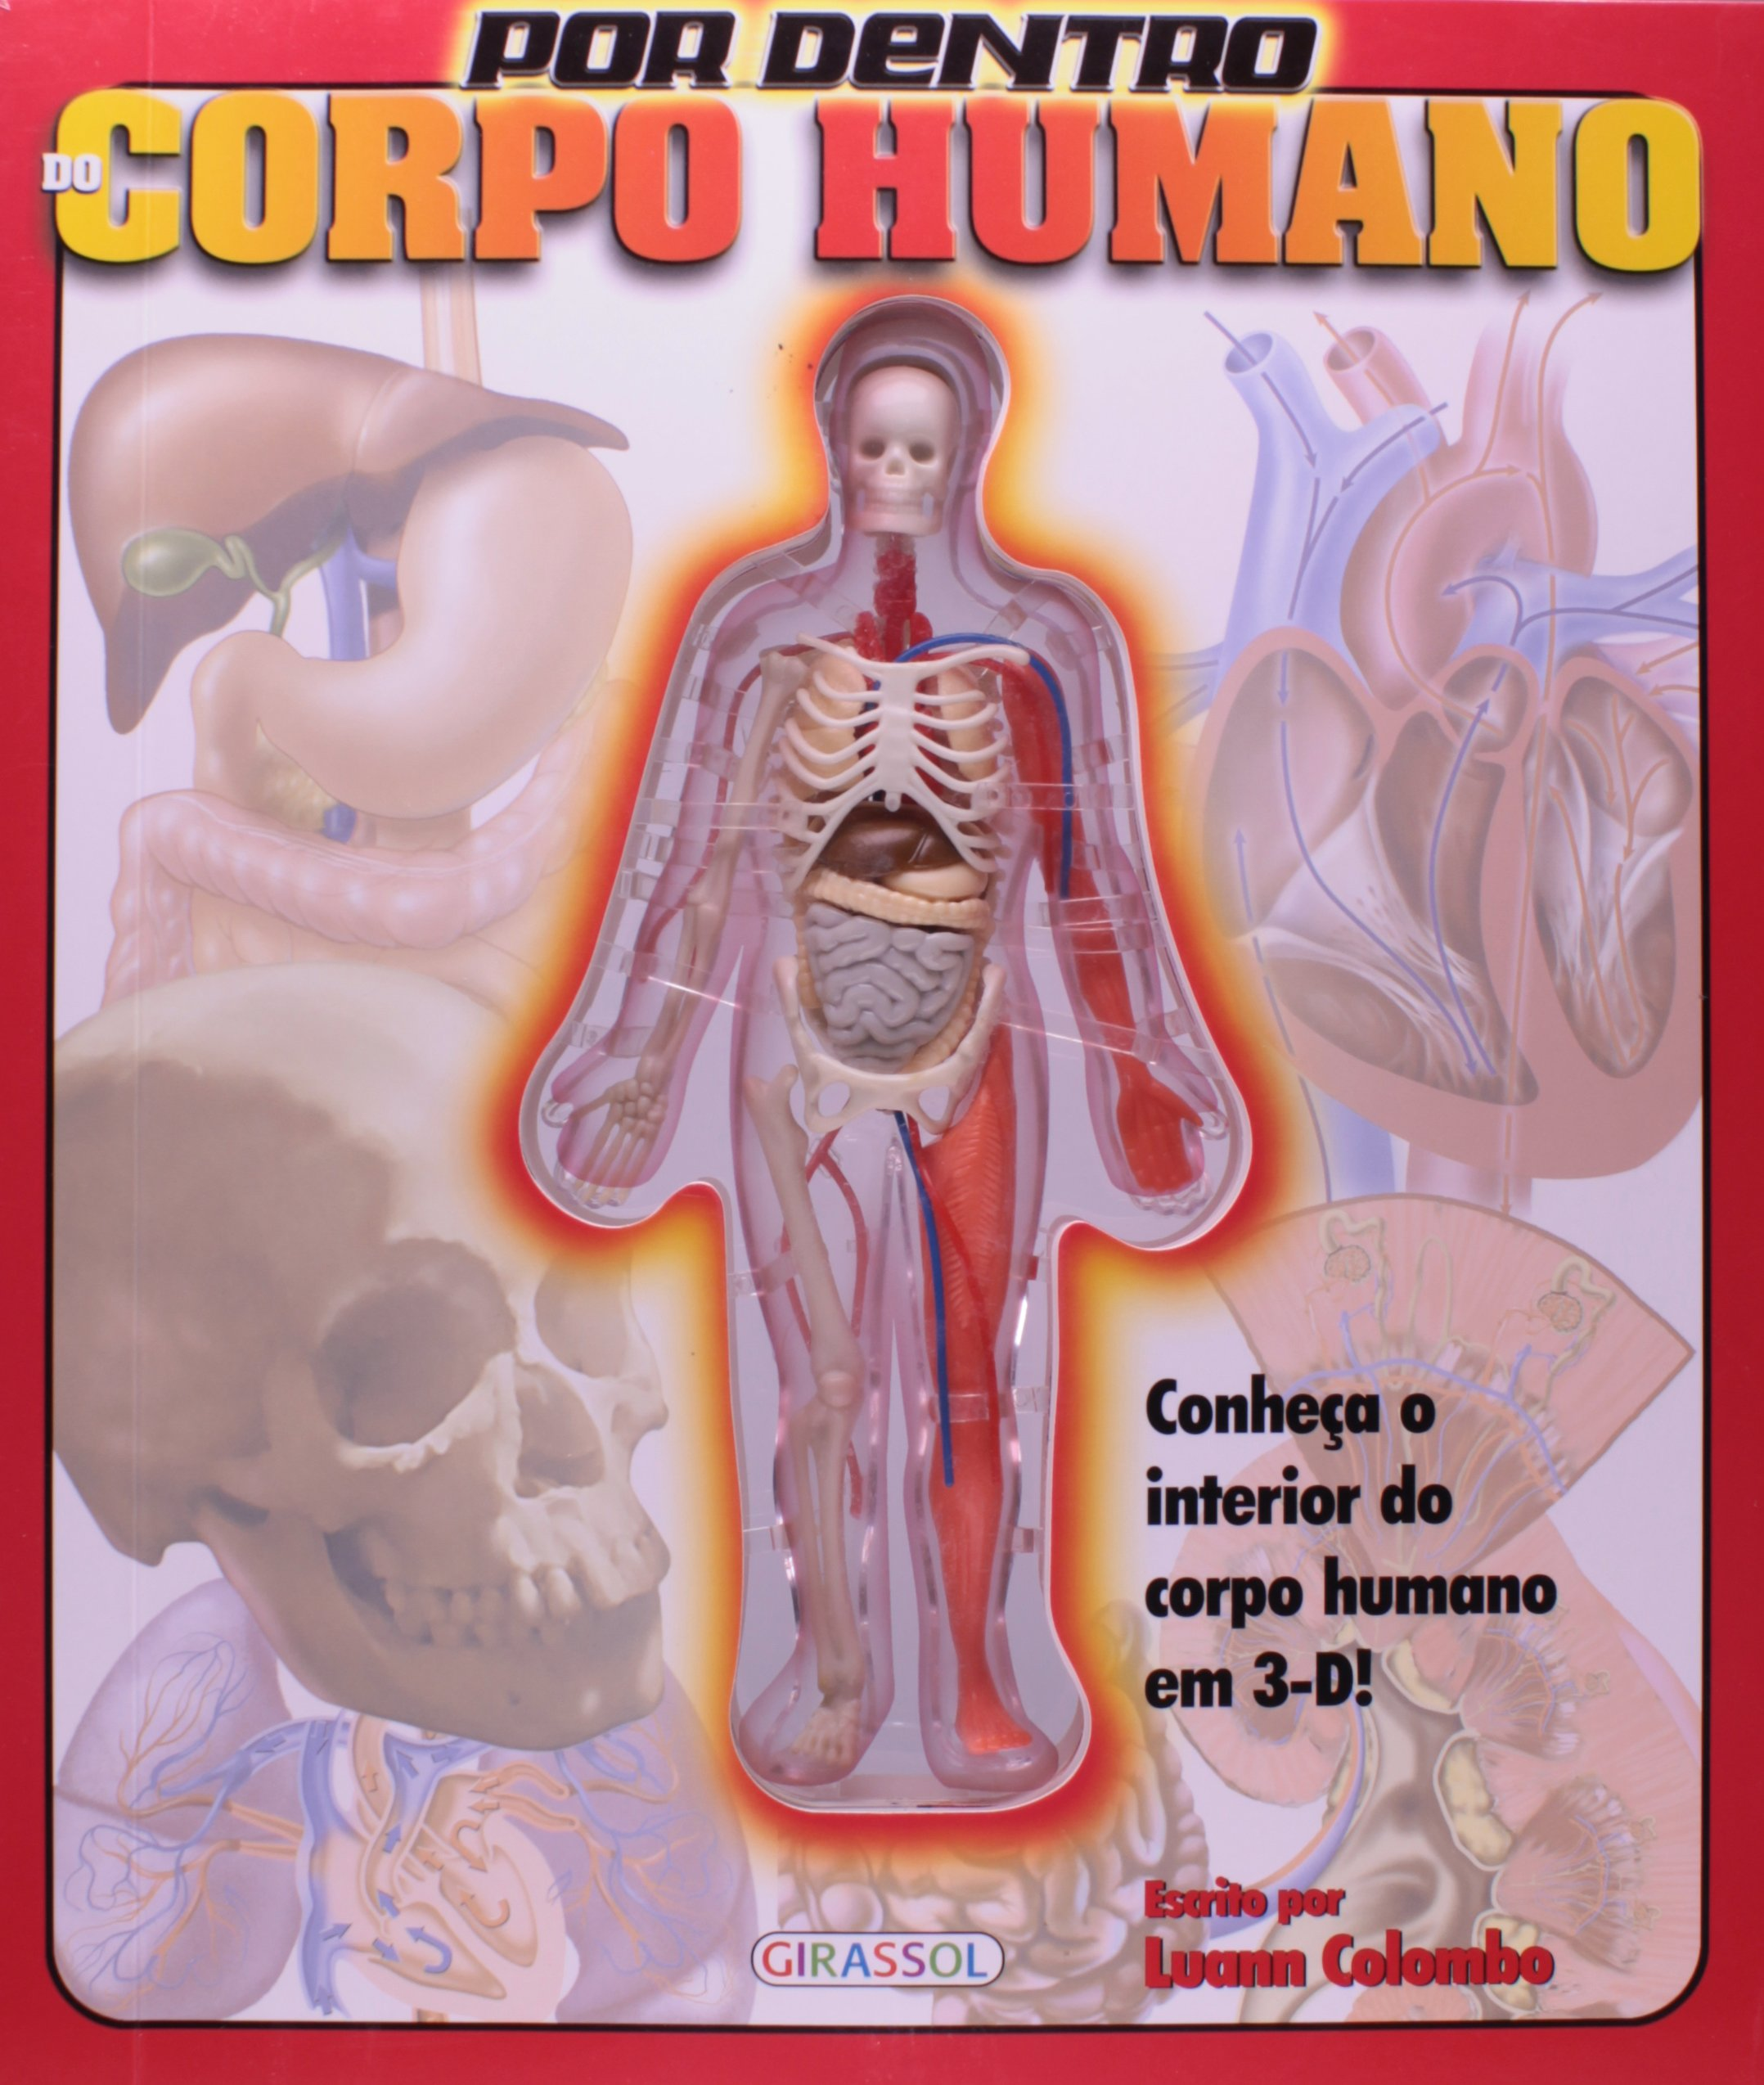 Por Dentro Do Corpo Humano Luann Colombo Max Steinmetz 9788574885230 Amazon Com Books